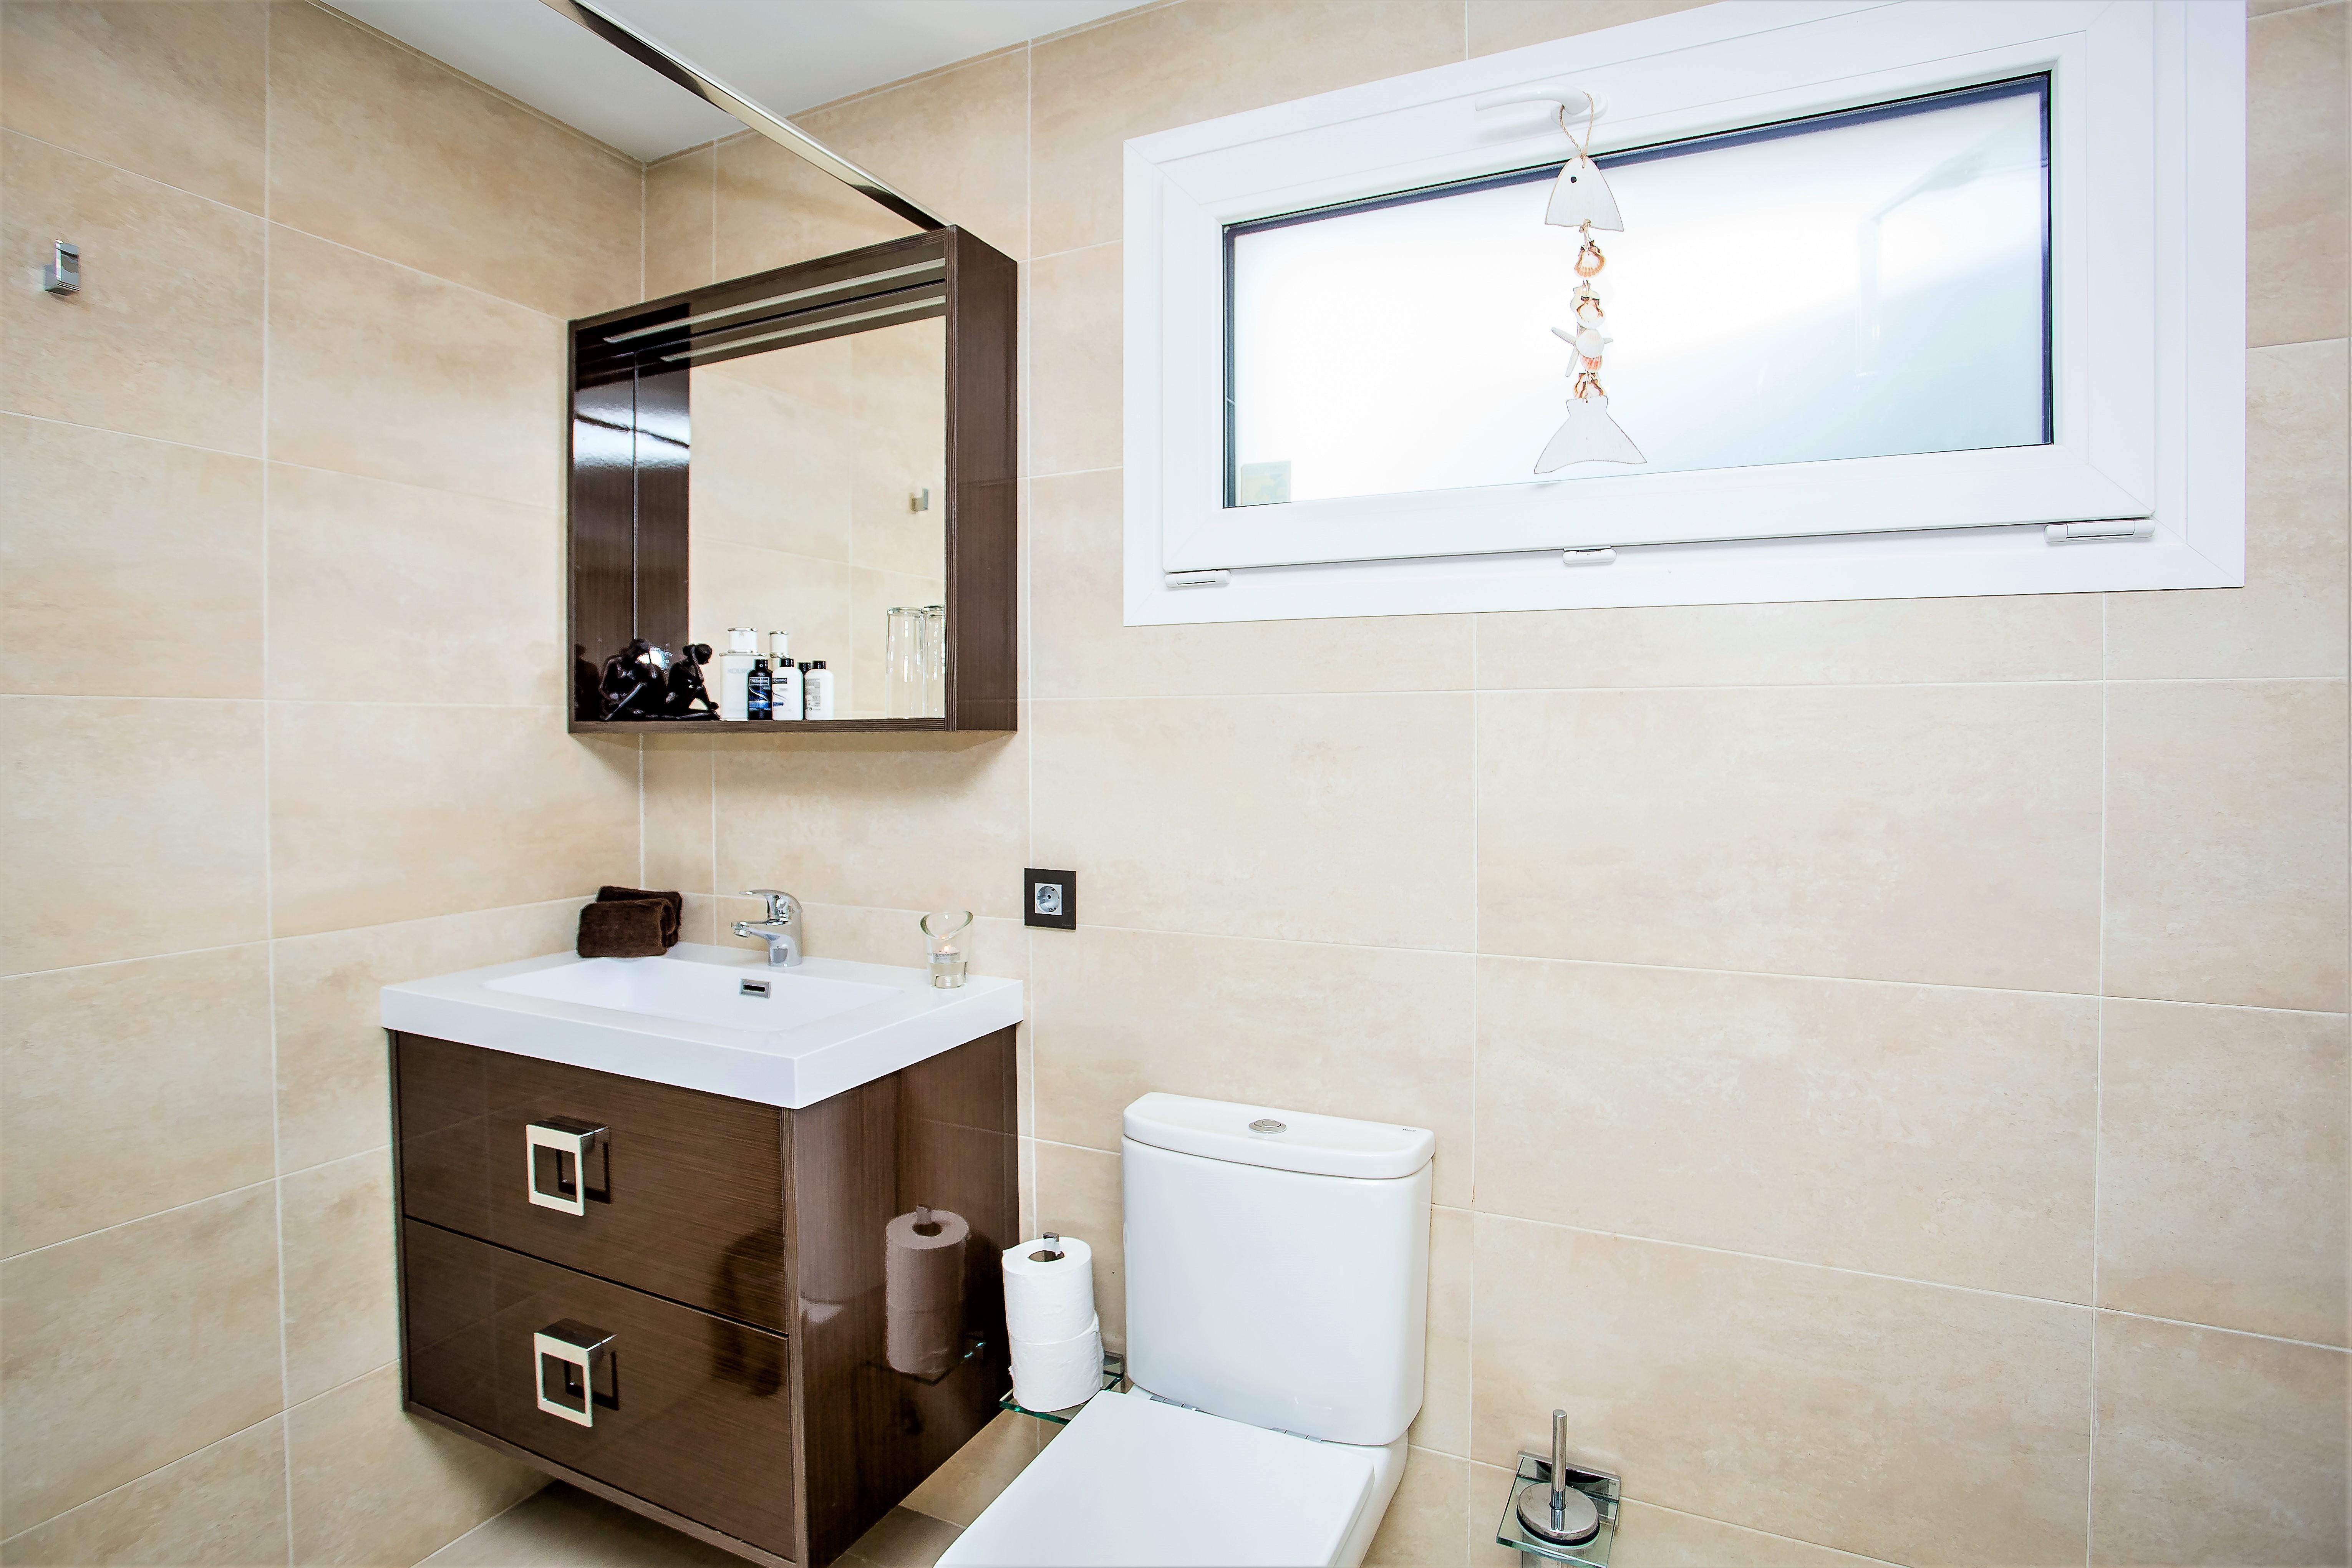 Apartment 6 B R VILLA BY PUERTO BANUS   SEA 5min                                photo 20203687